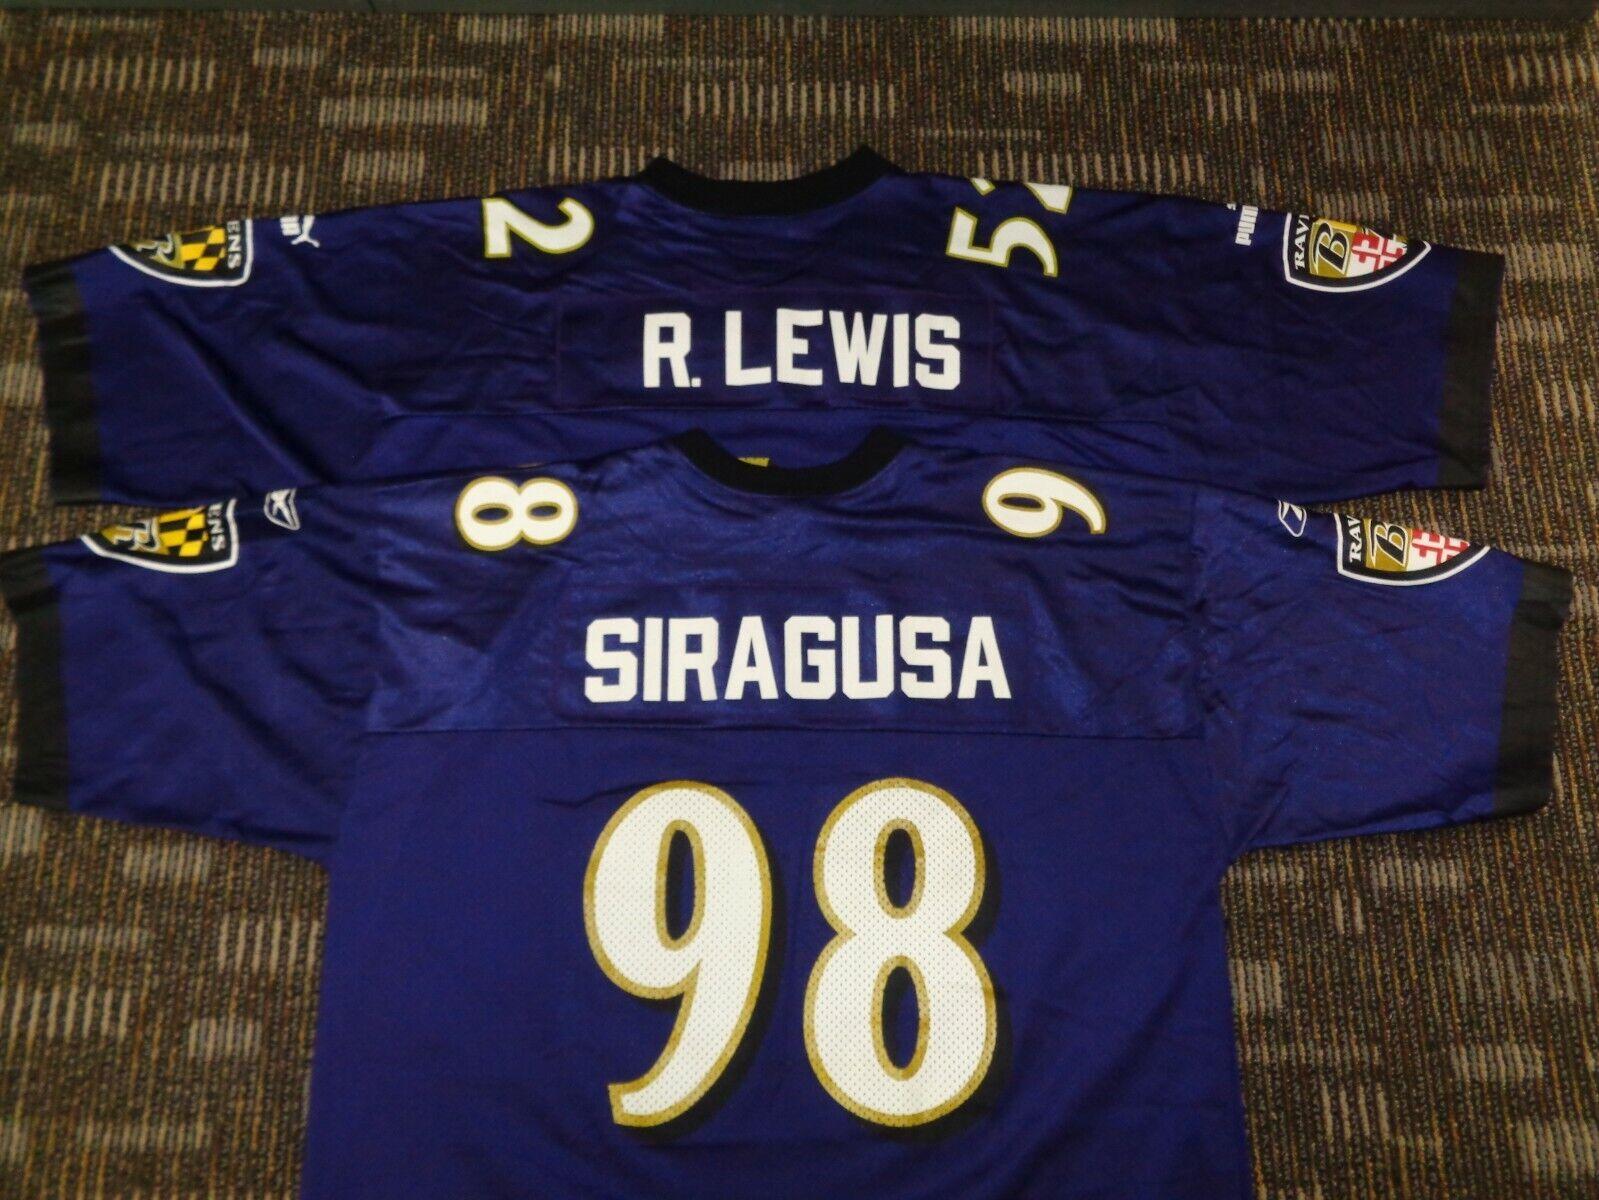 LOT-TONY SIRAGUSA RAY LEWIS BALTIMORE RAVENS REEBOK NFL GAME FOOTBALL JERSEYS - $59.99